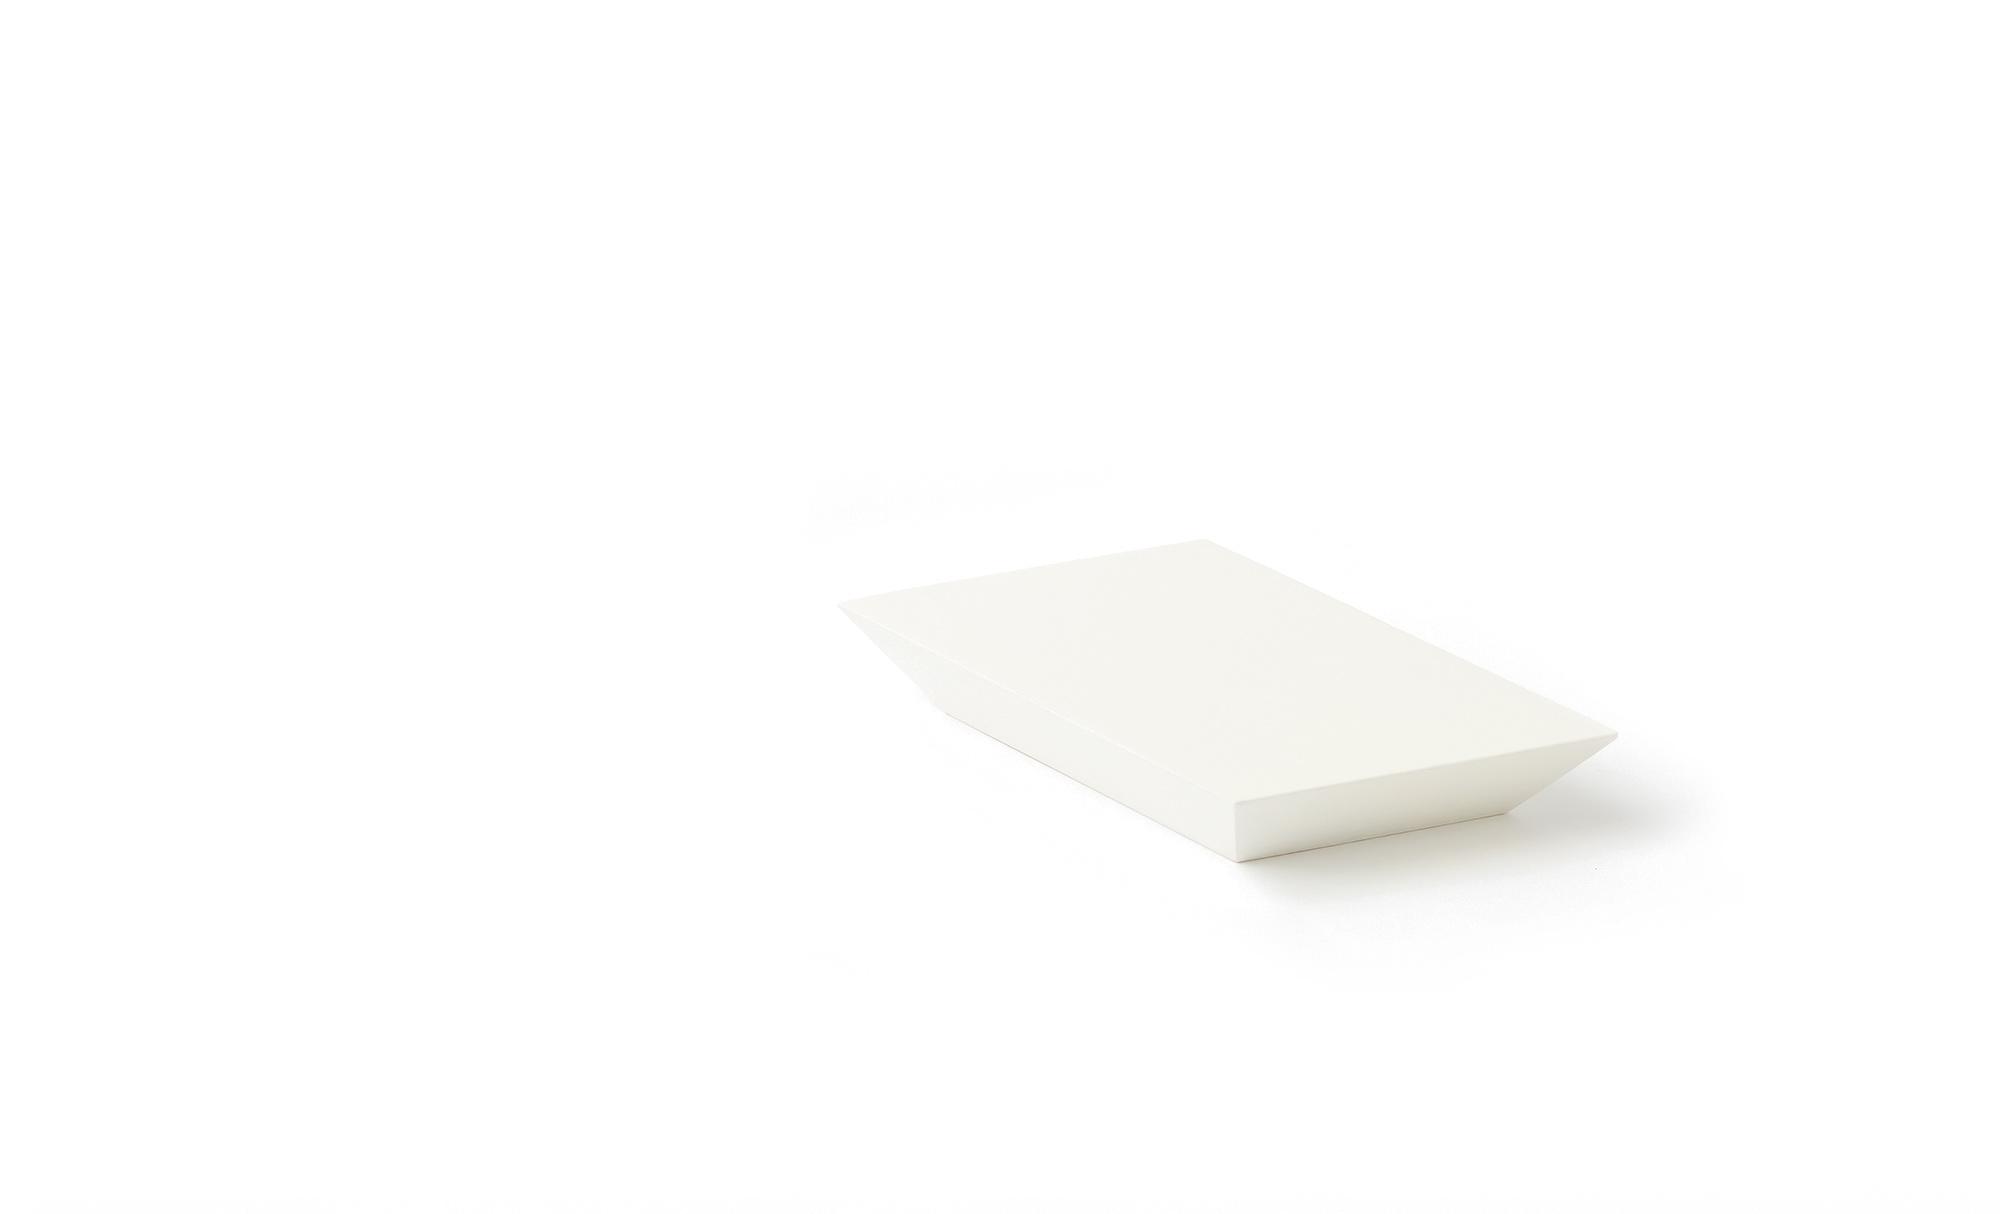 Caldera Plates : Small Flat   FIL